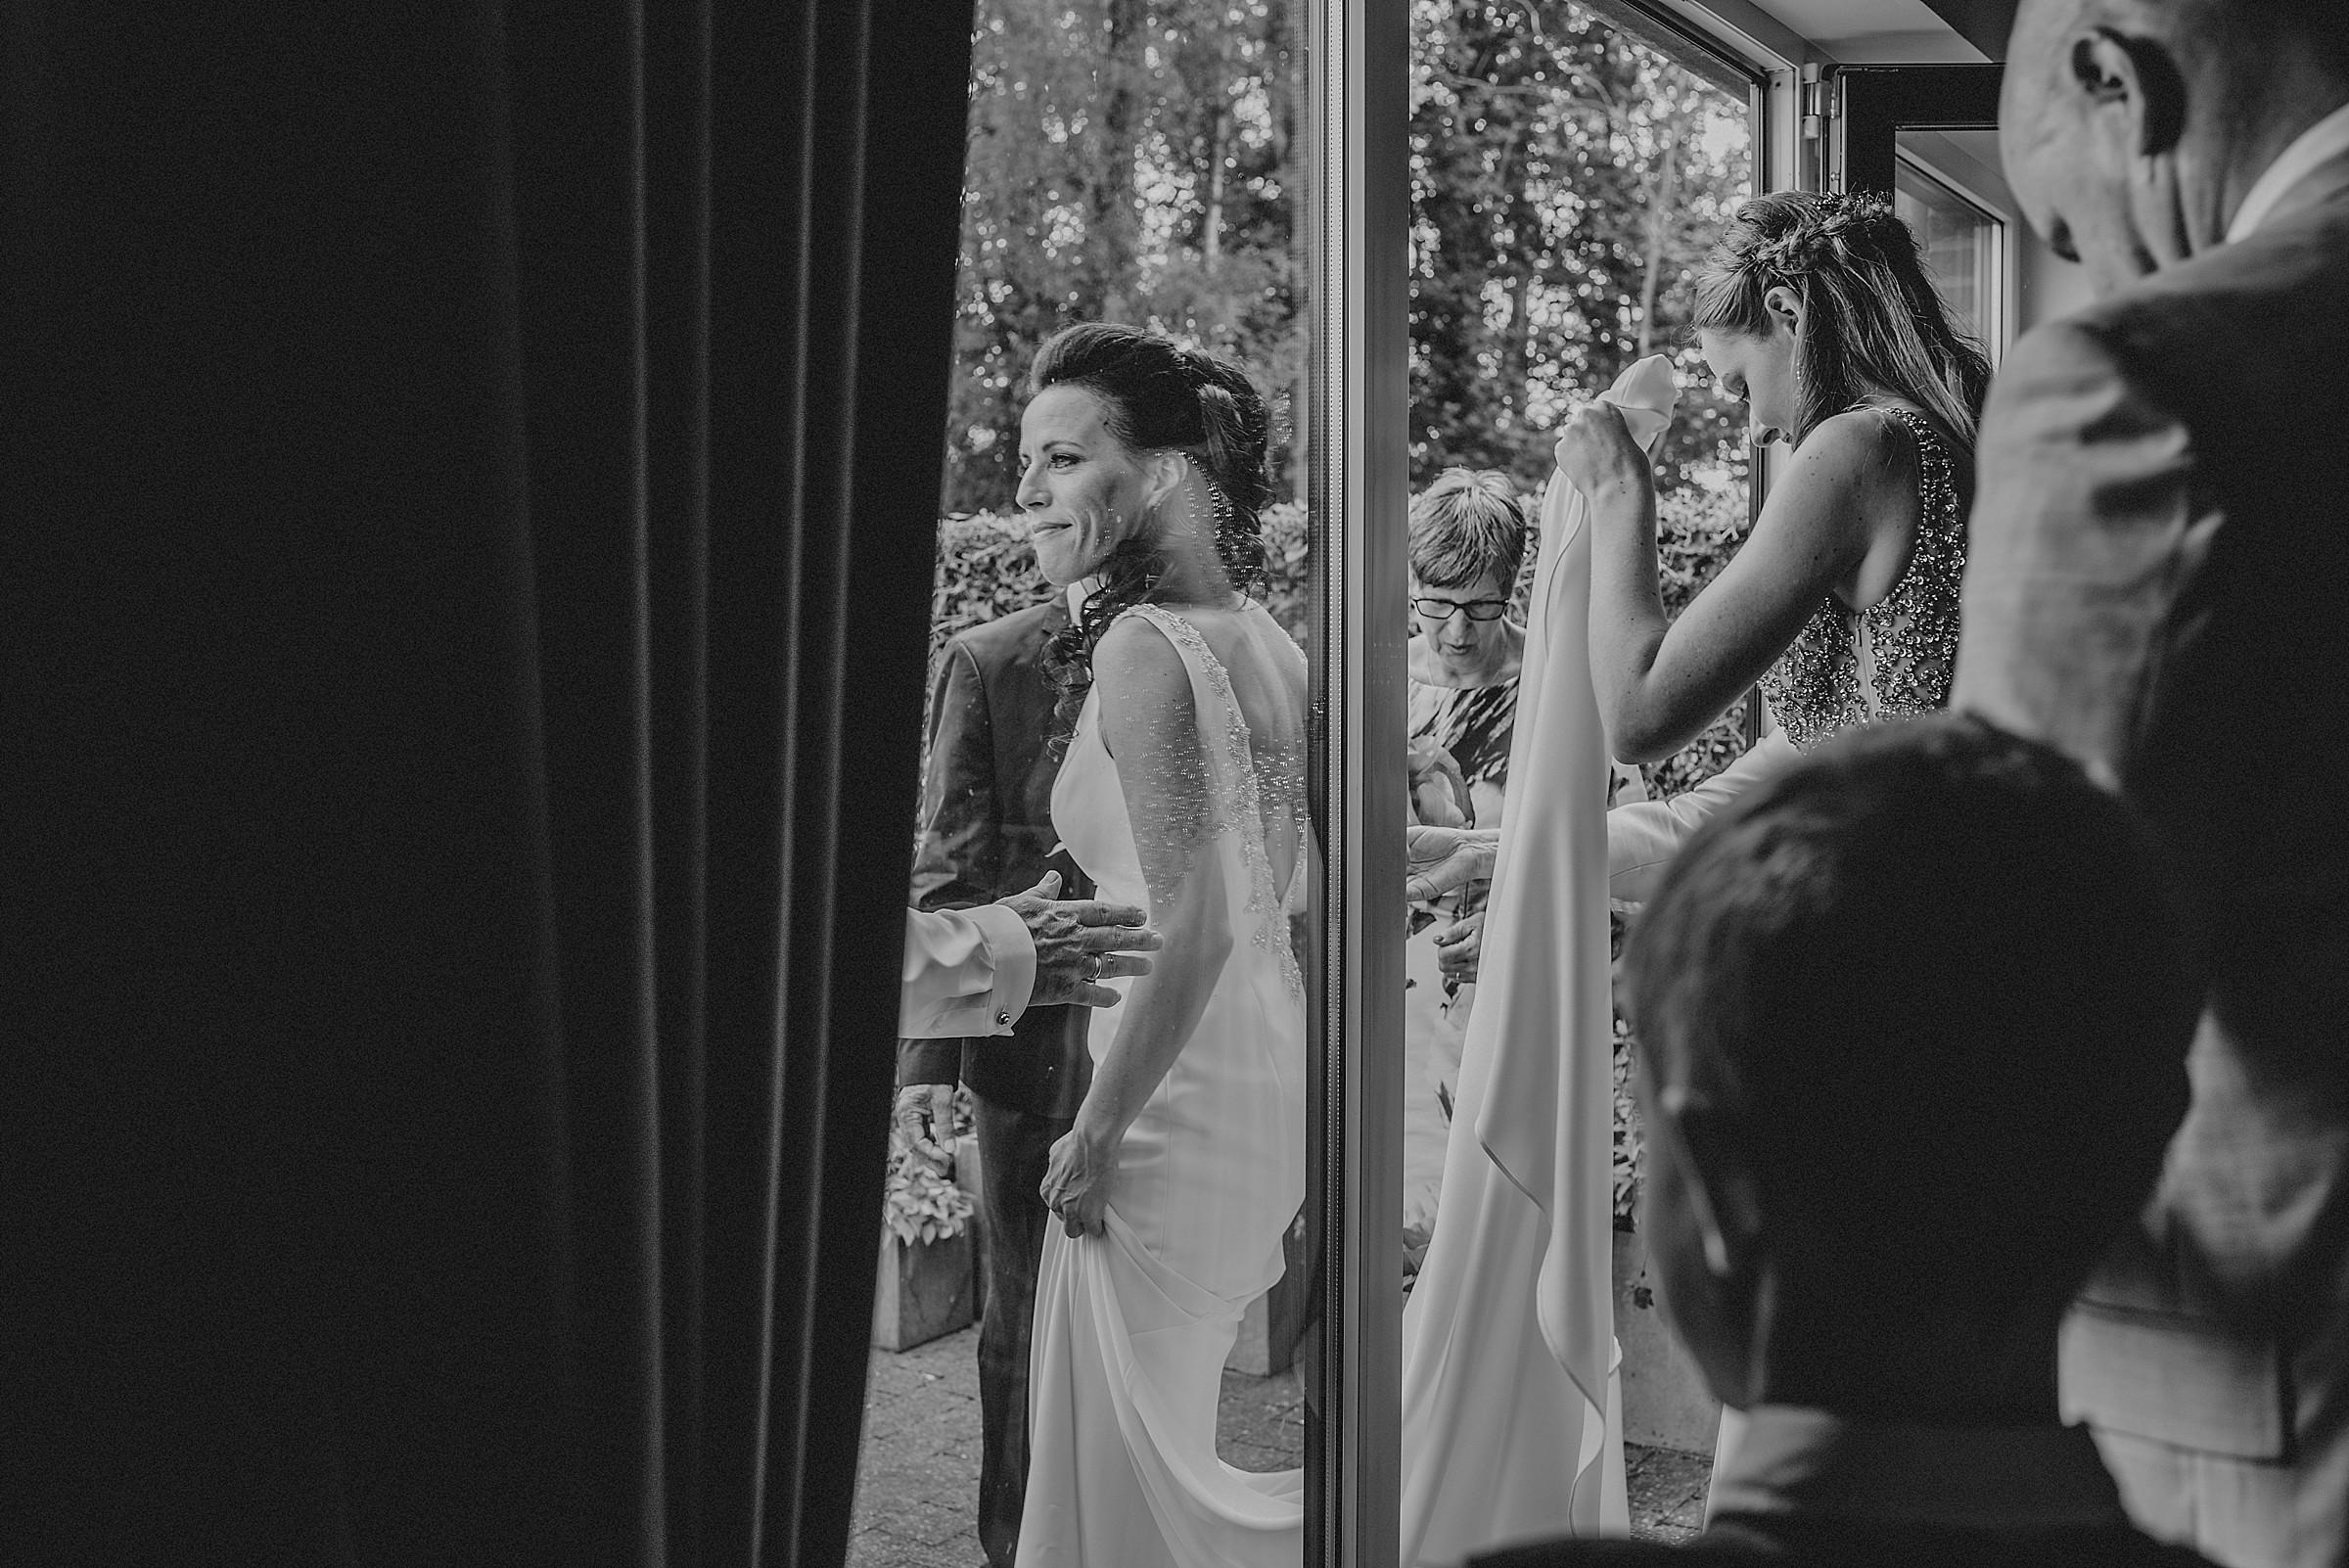 weddingbelgium_0020.jpg